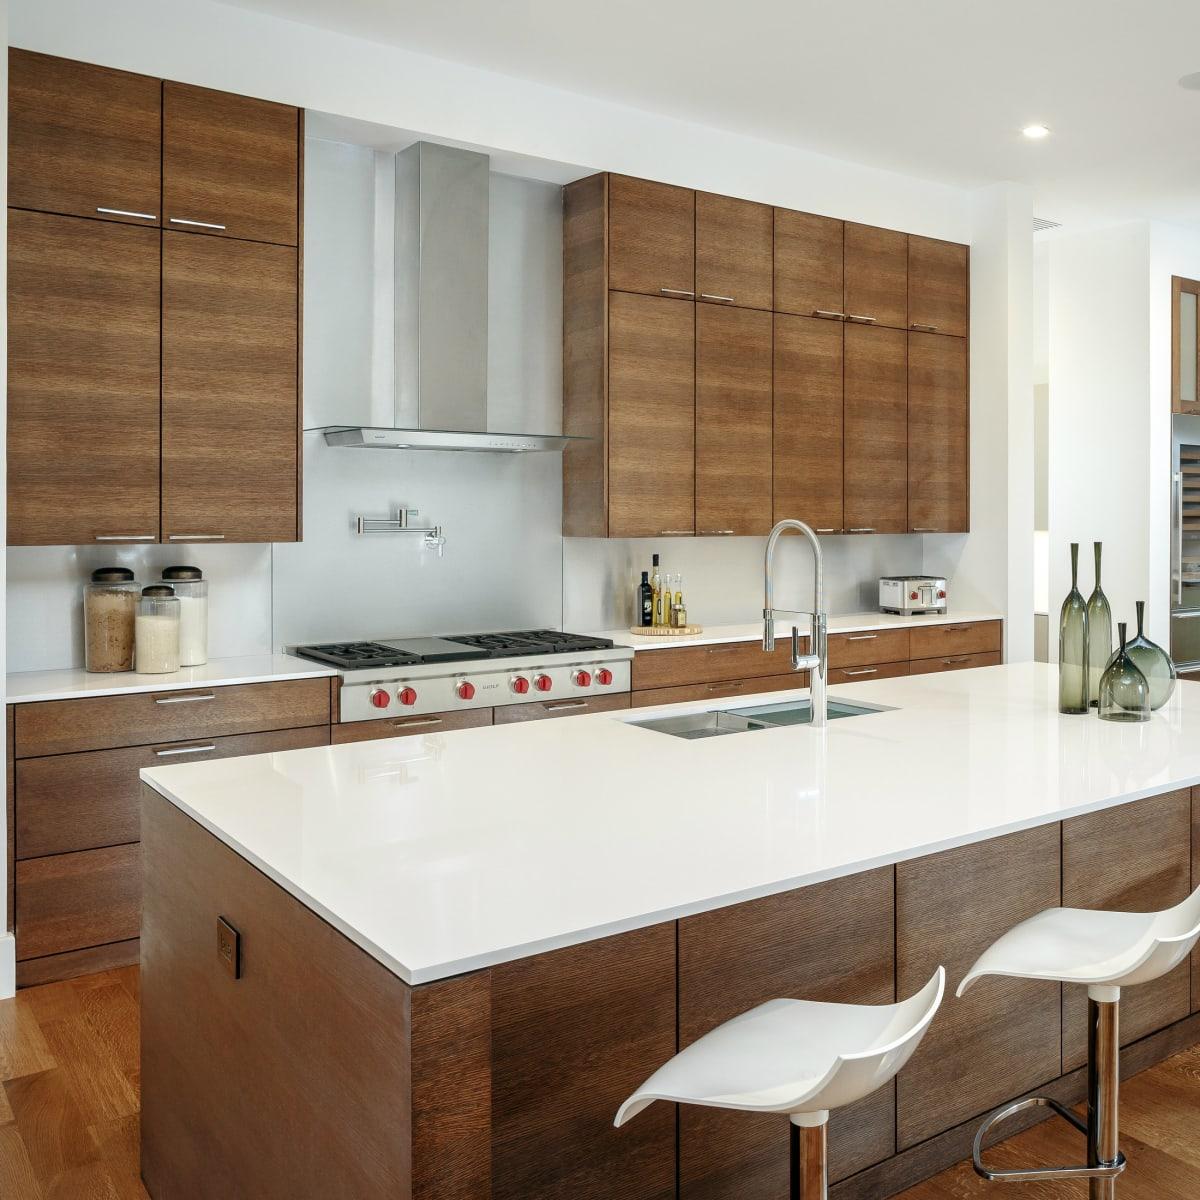 Kitchen at 5746 Greenbriar in Dallas